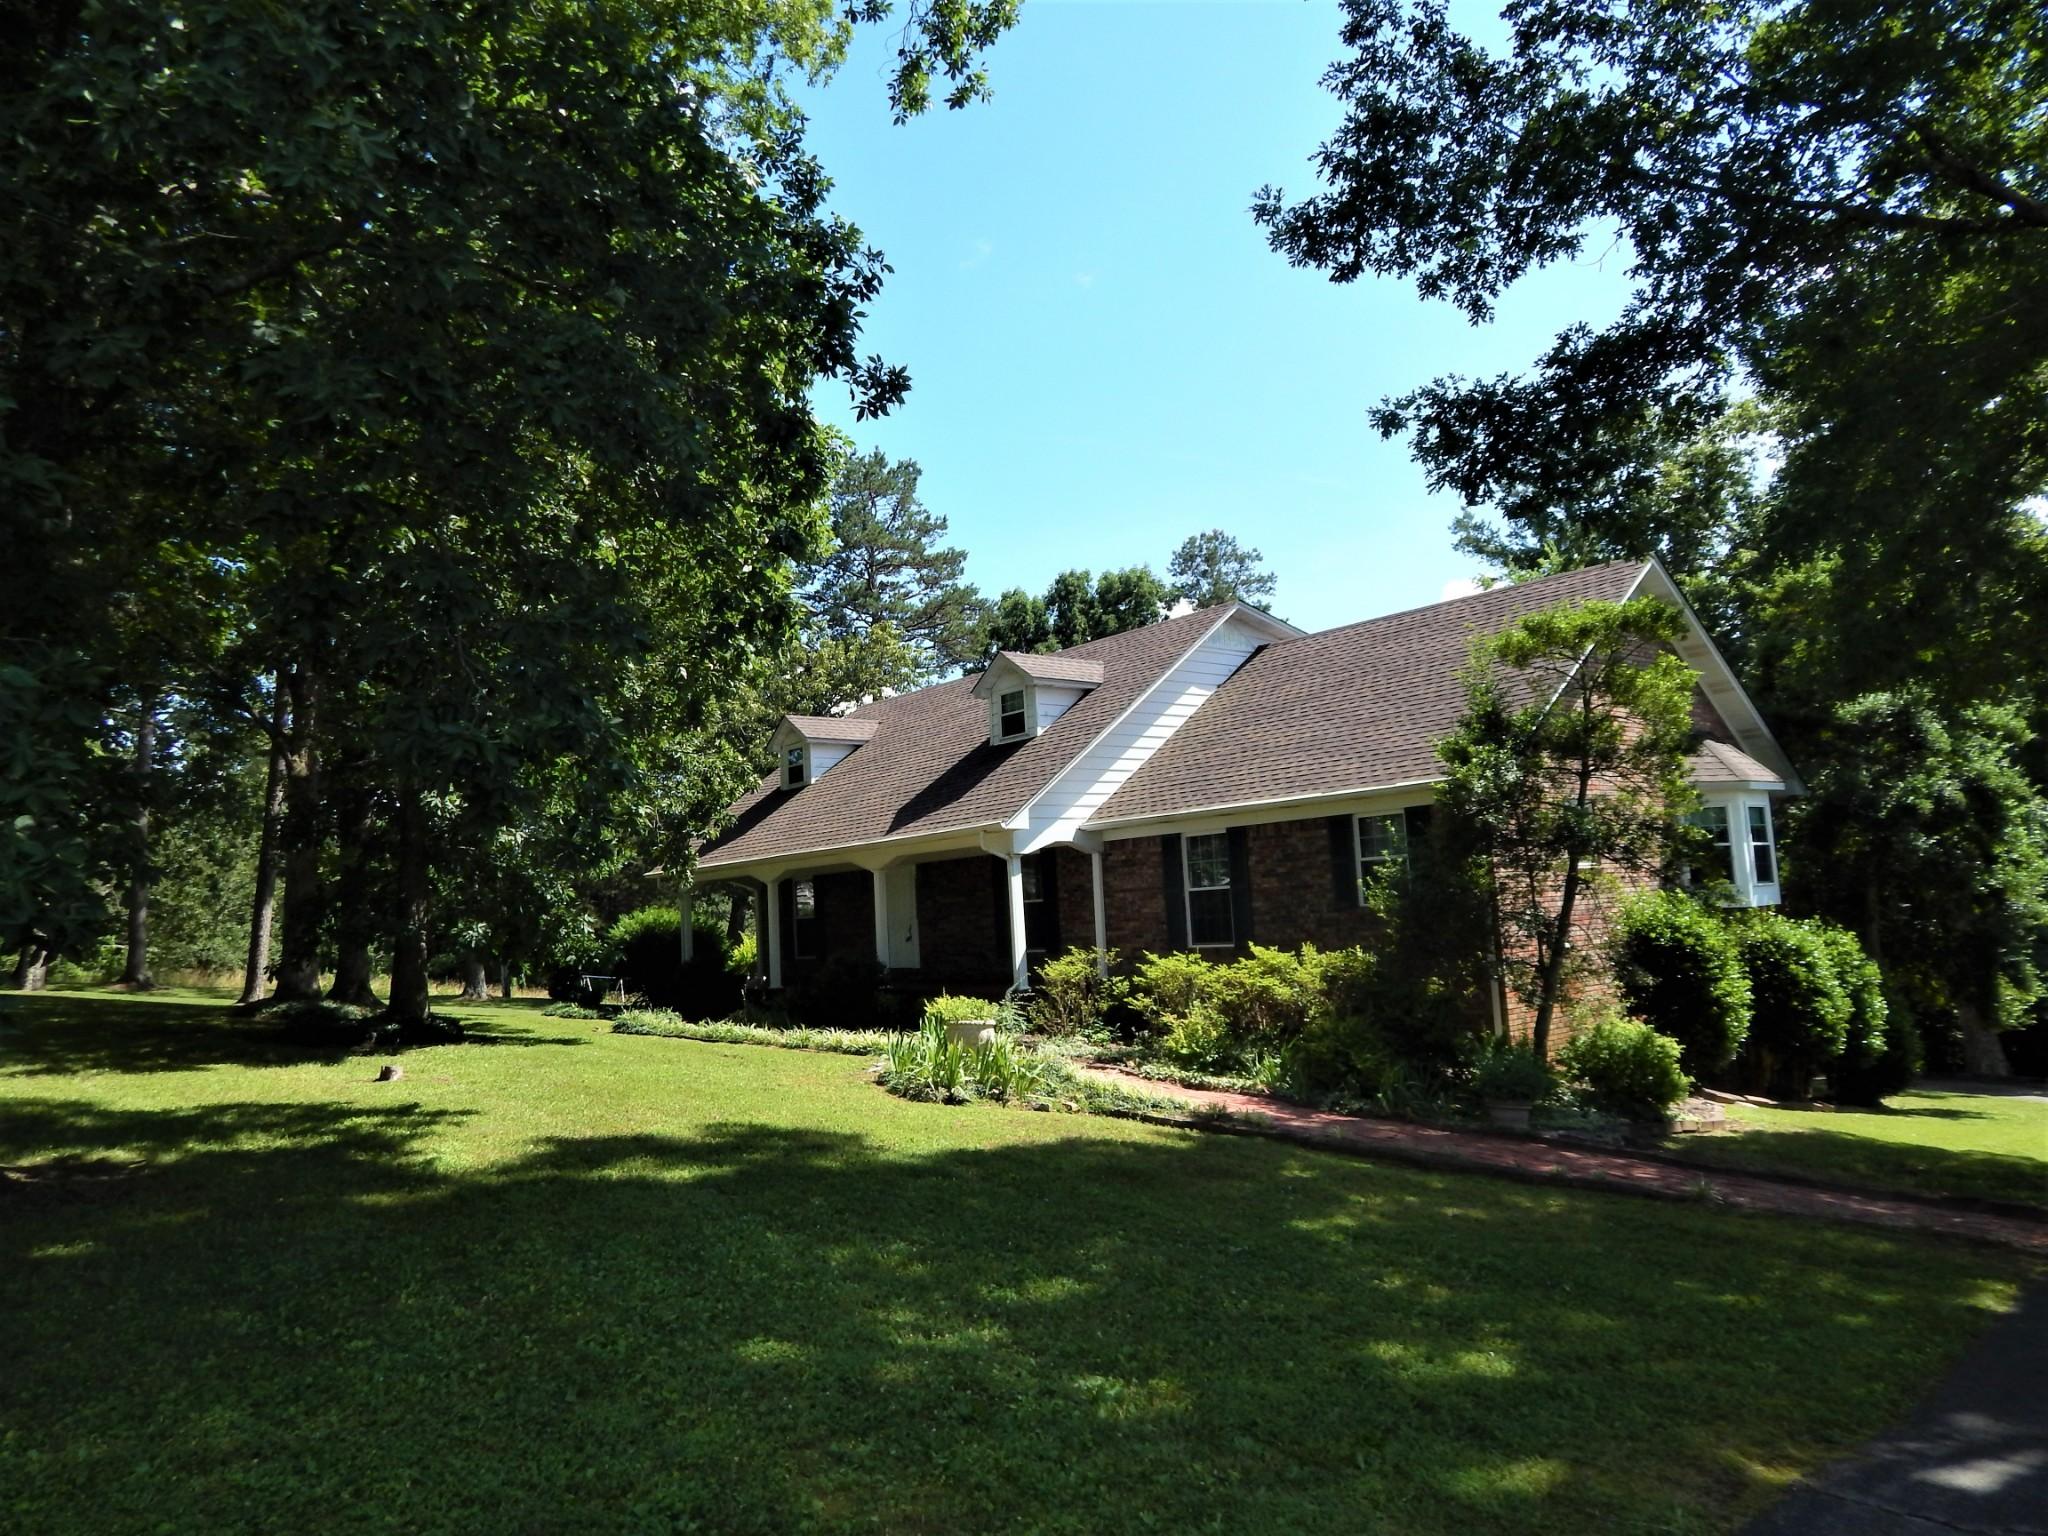 800 Hwy 64 E, Waynesboro, TN 38485 - Waynesboro, TN real estate listing